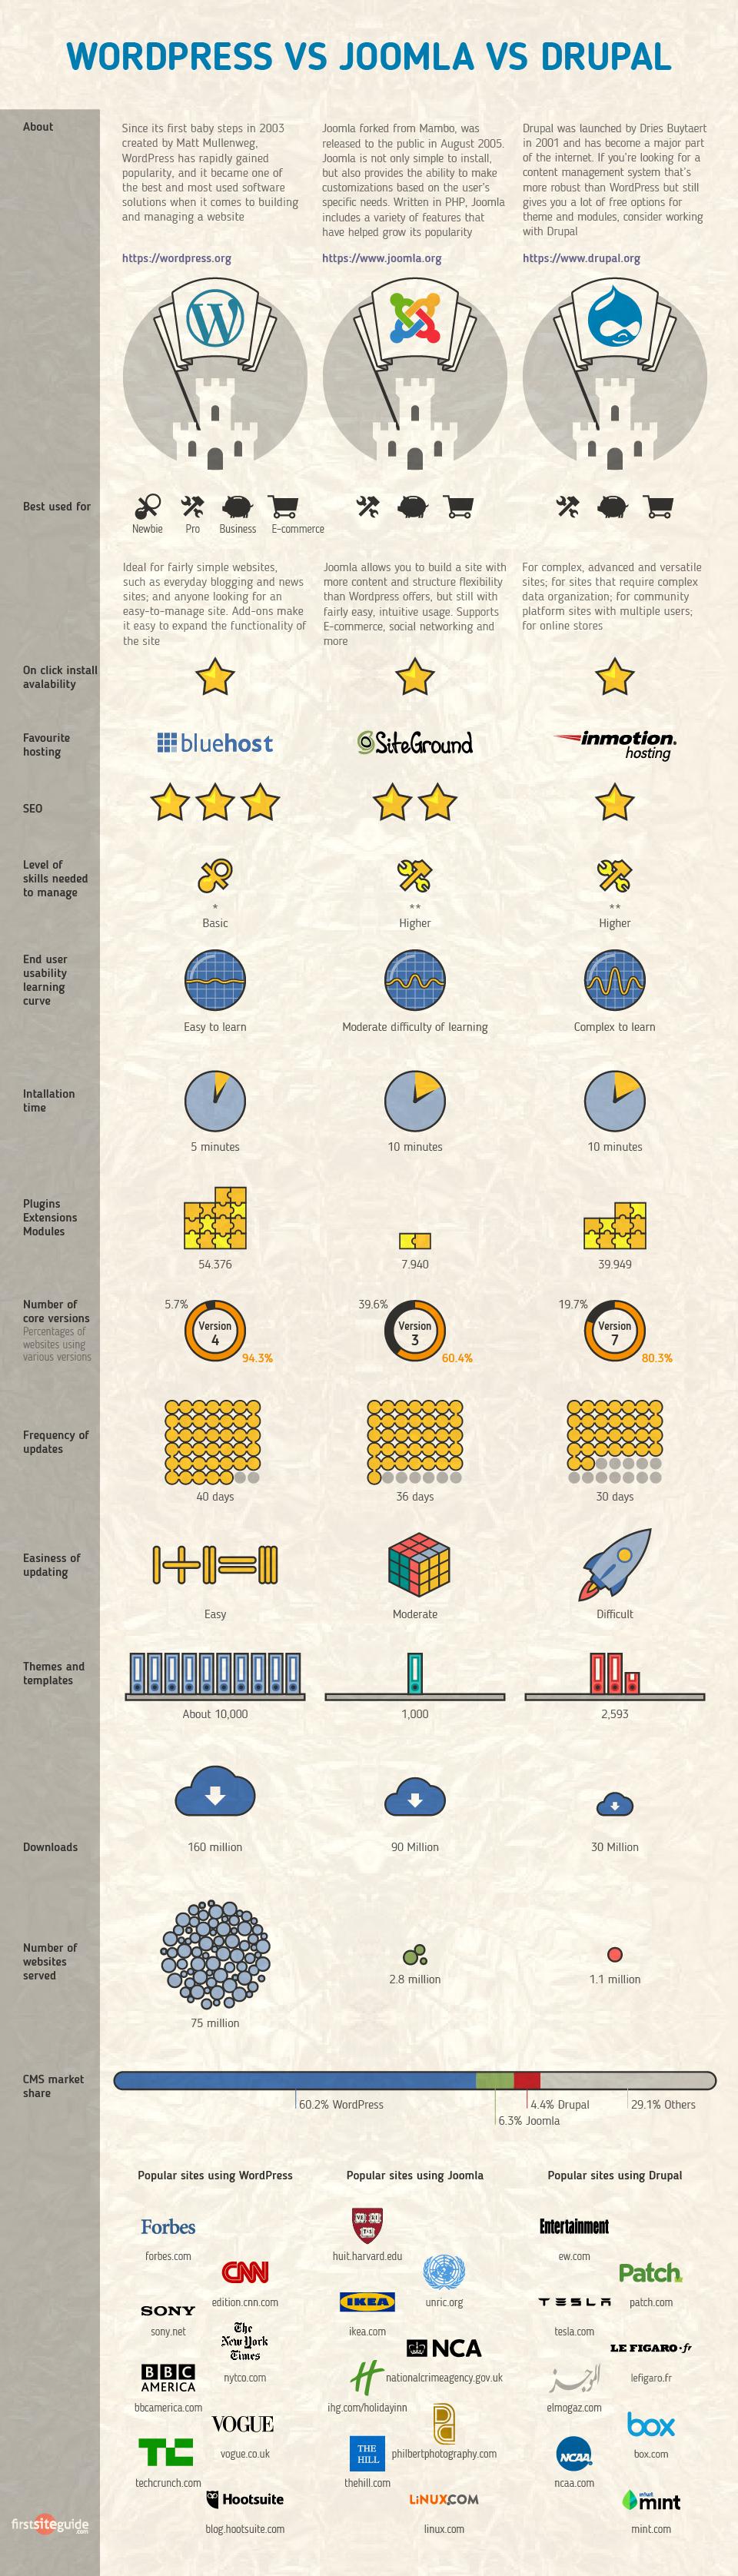 wordpress vs joomla vs drupal Infographic